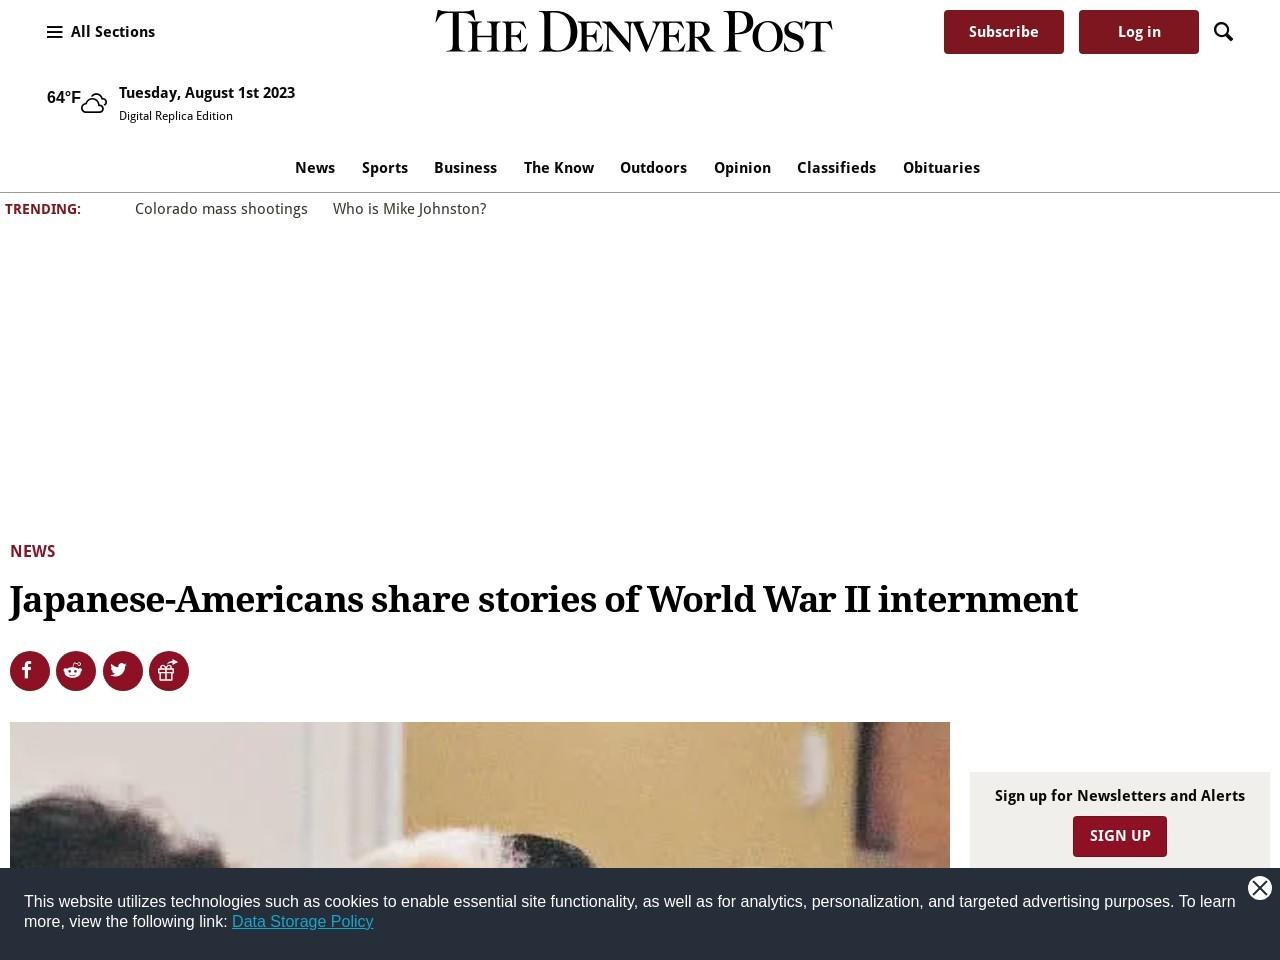 Japanese-Americans share stories of World War II internment